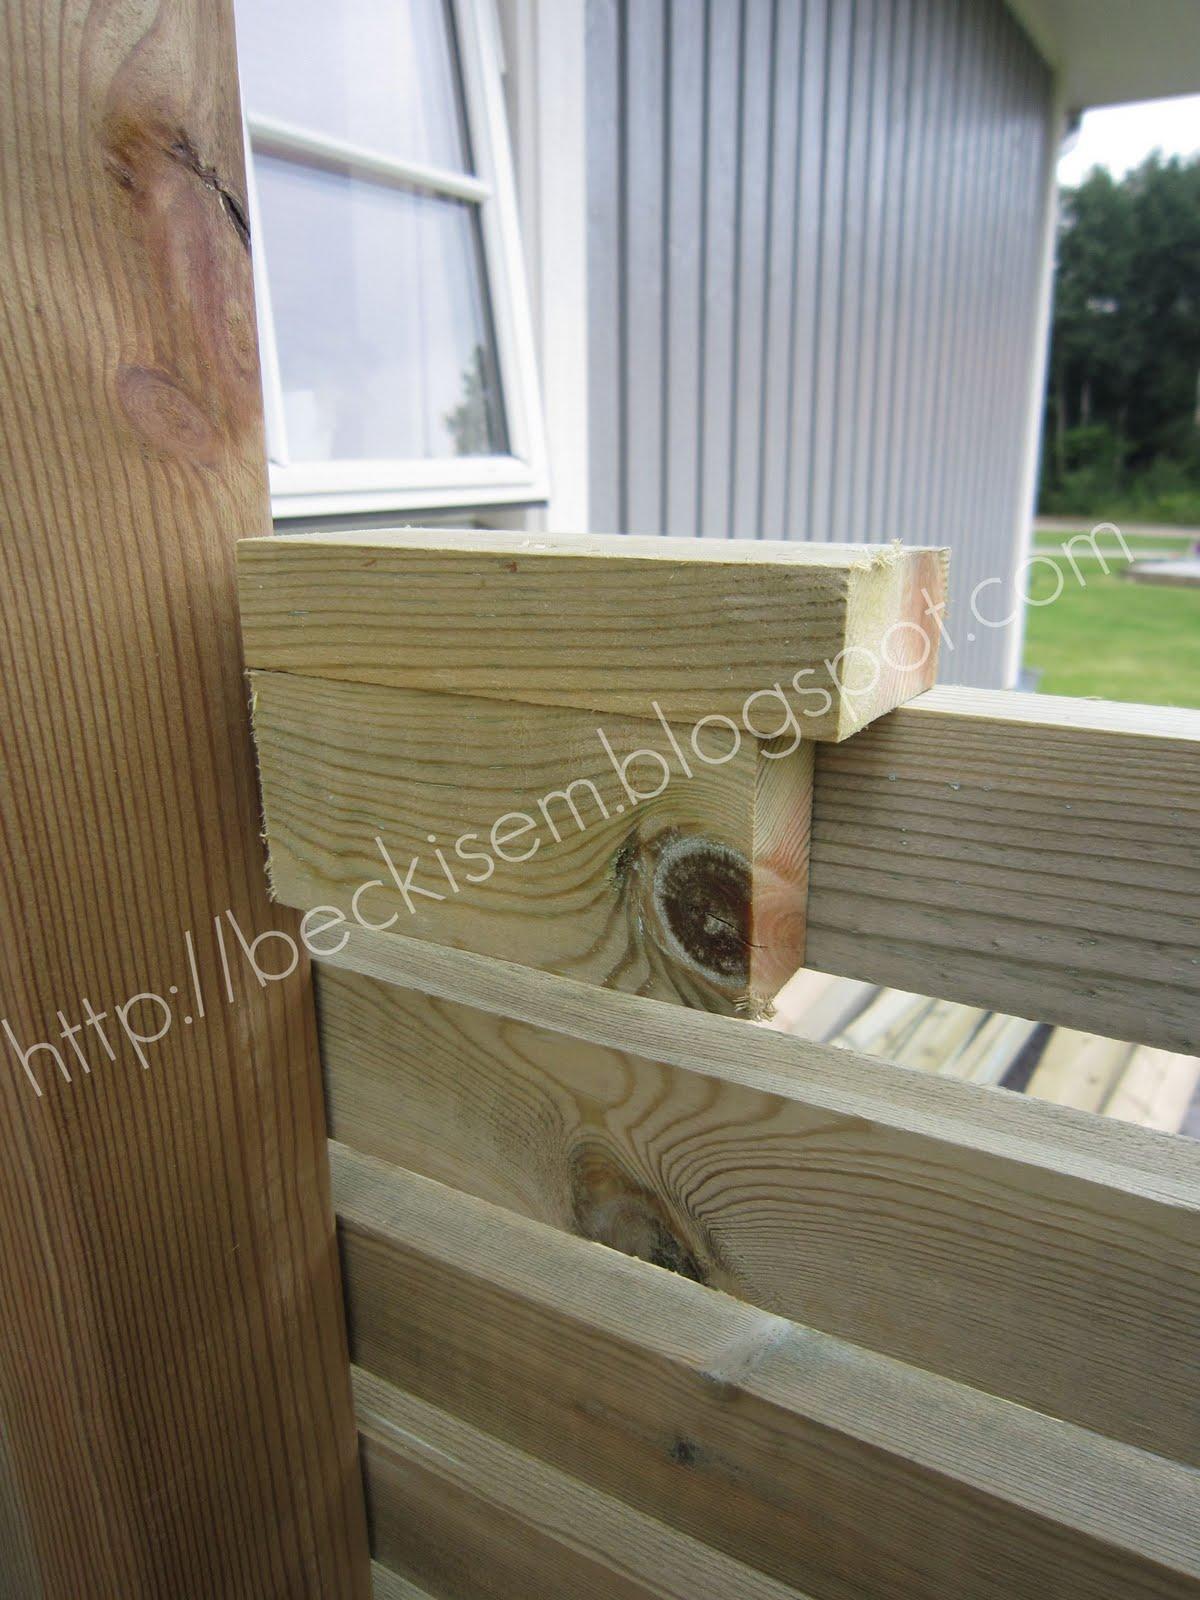 Beckis & Em - Villa Trend: Vindskydd och staket